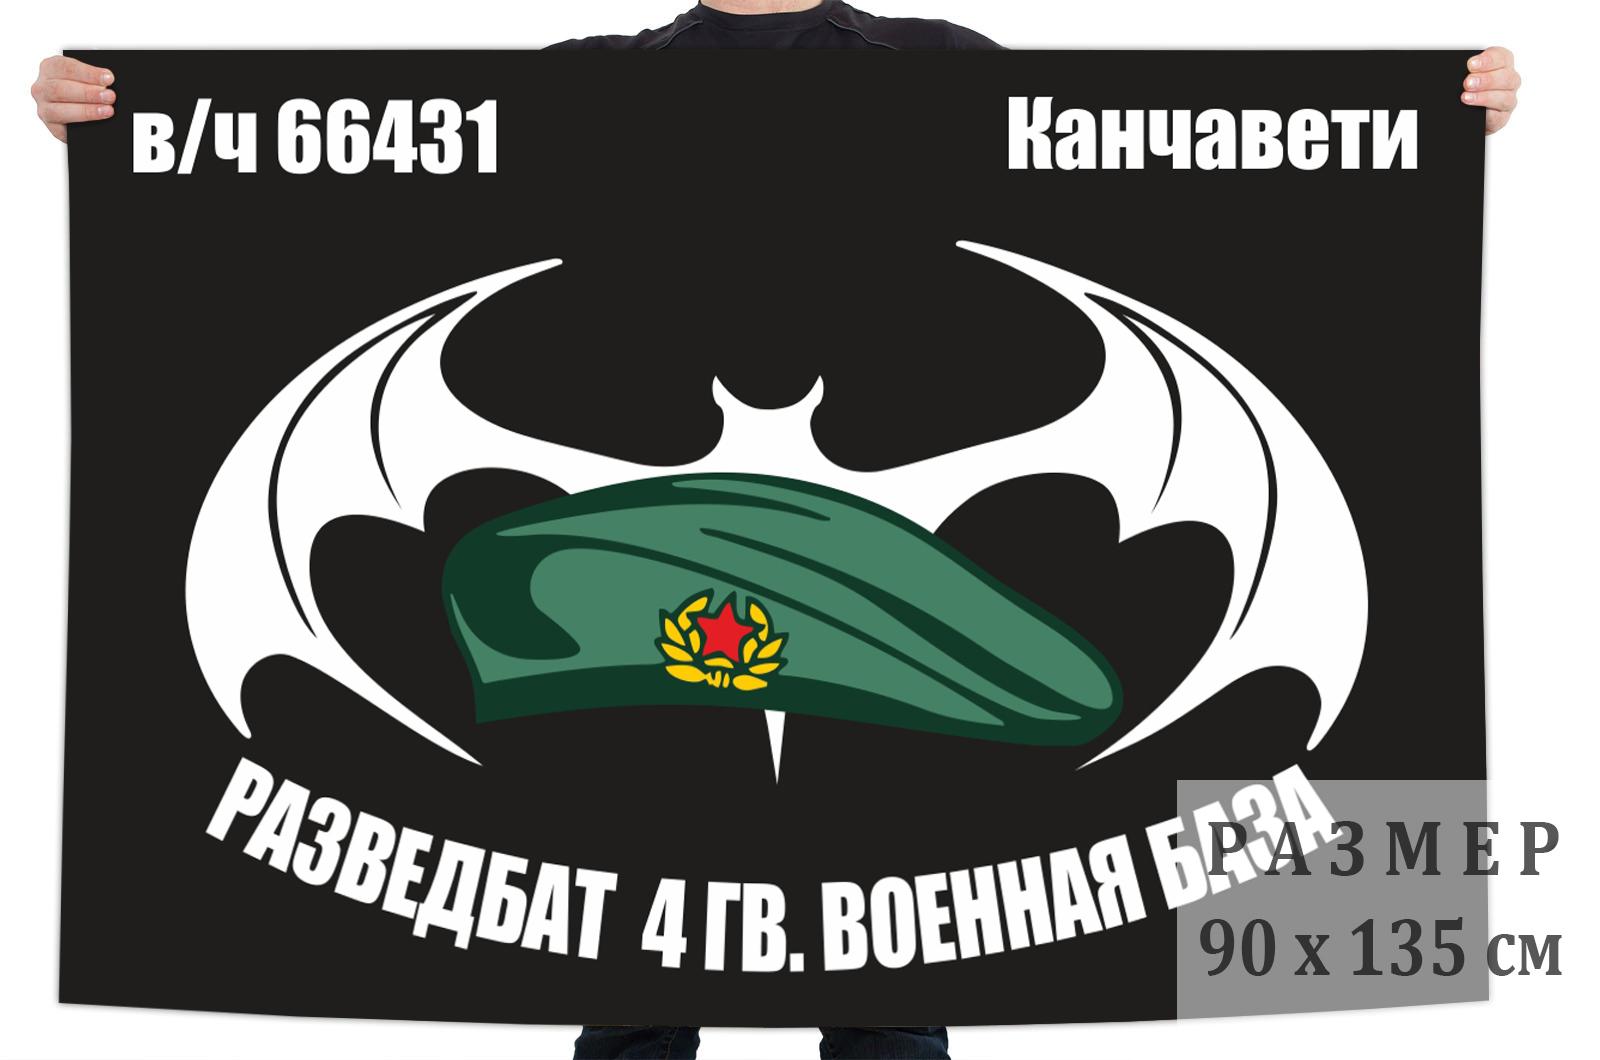 Флаг Разведбат 4 гв. Военная база Канчавети